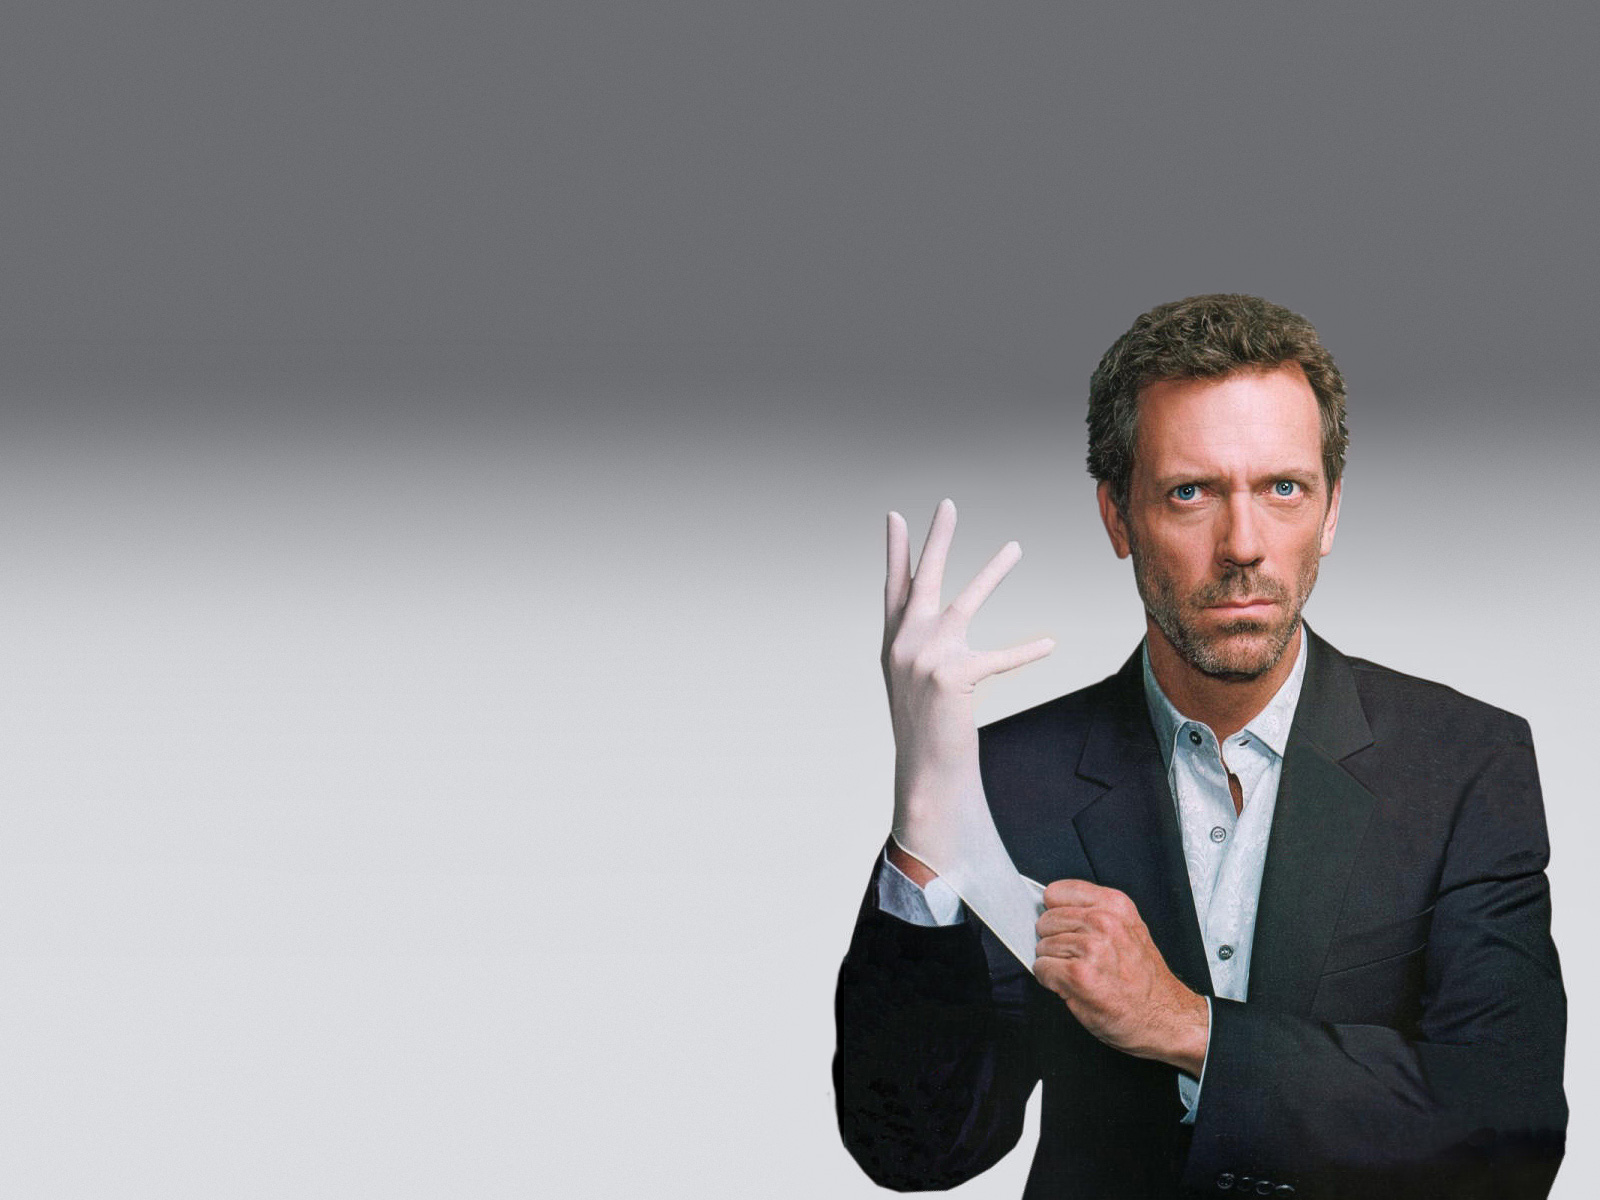 Обои с героями сериала Доктор Хаус (House)